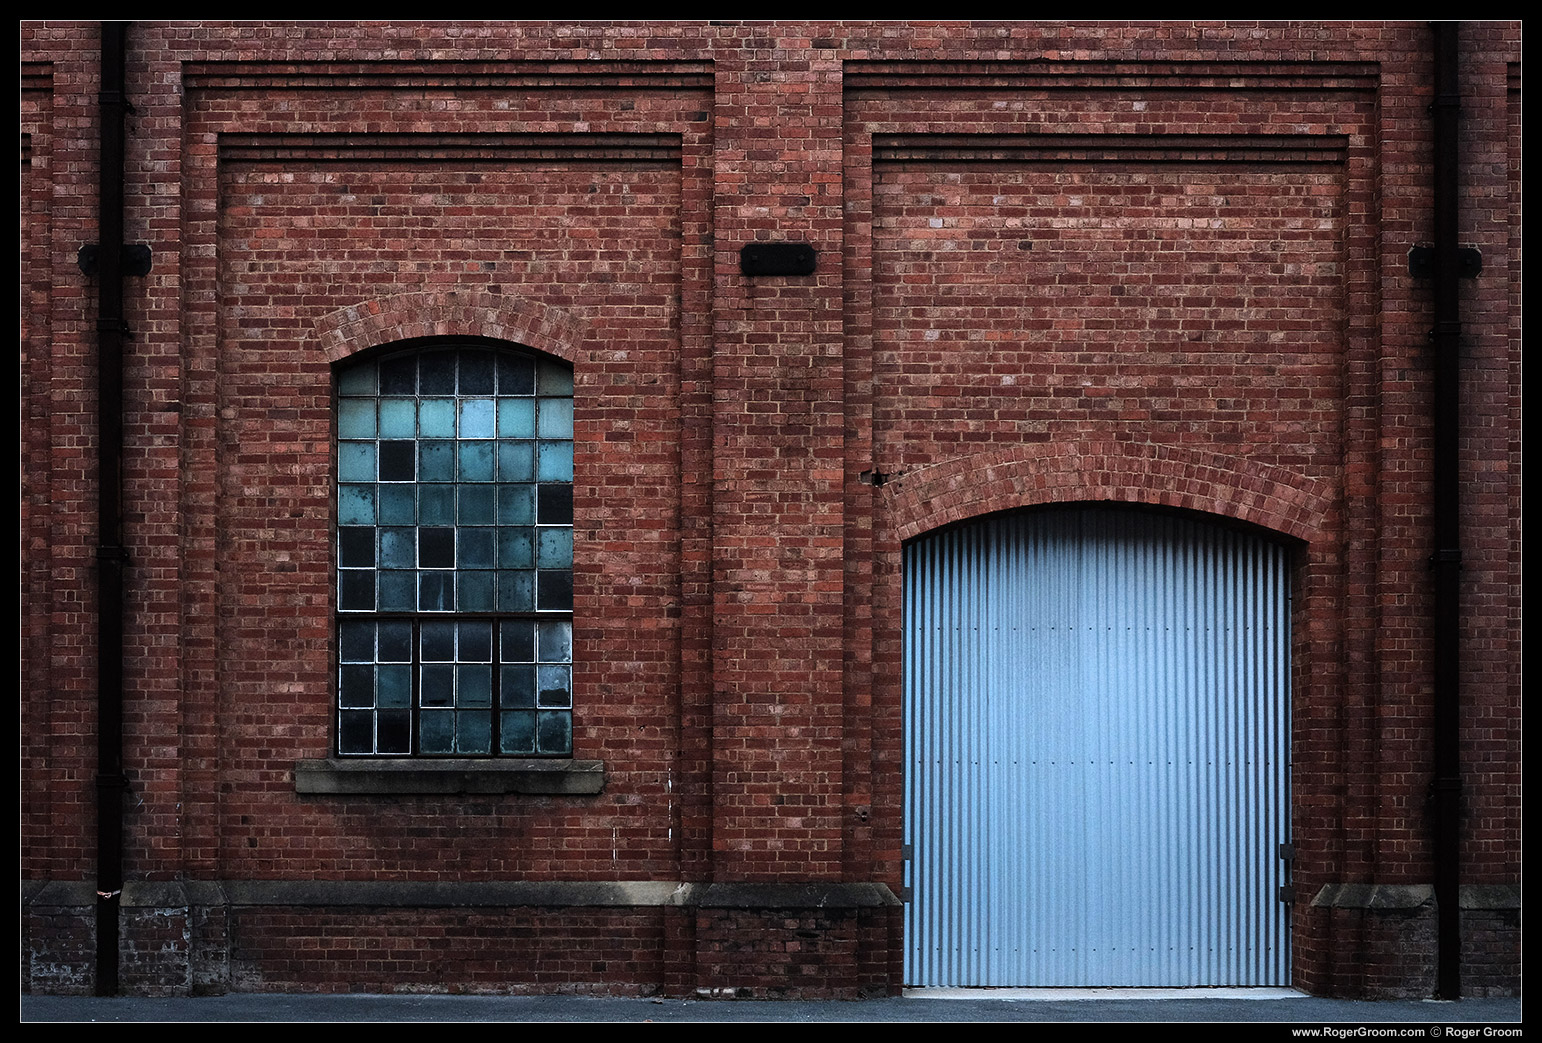 Midland Railway Workshops